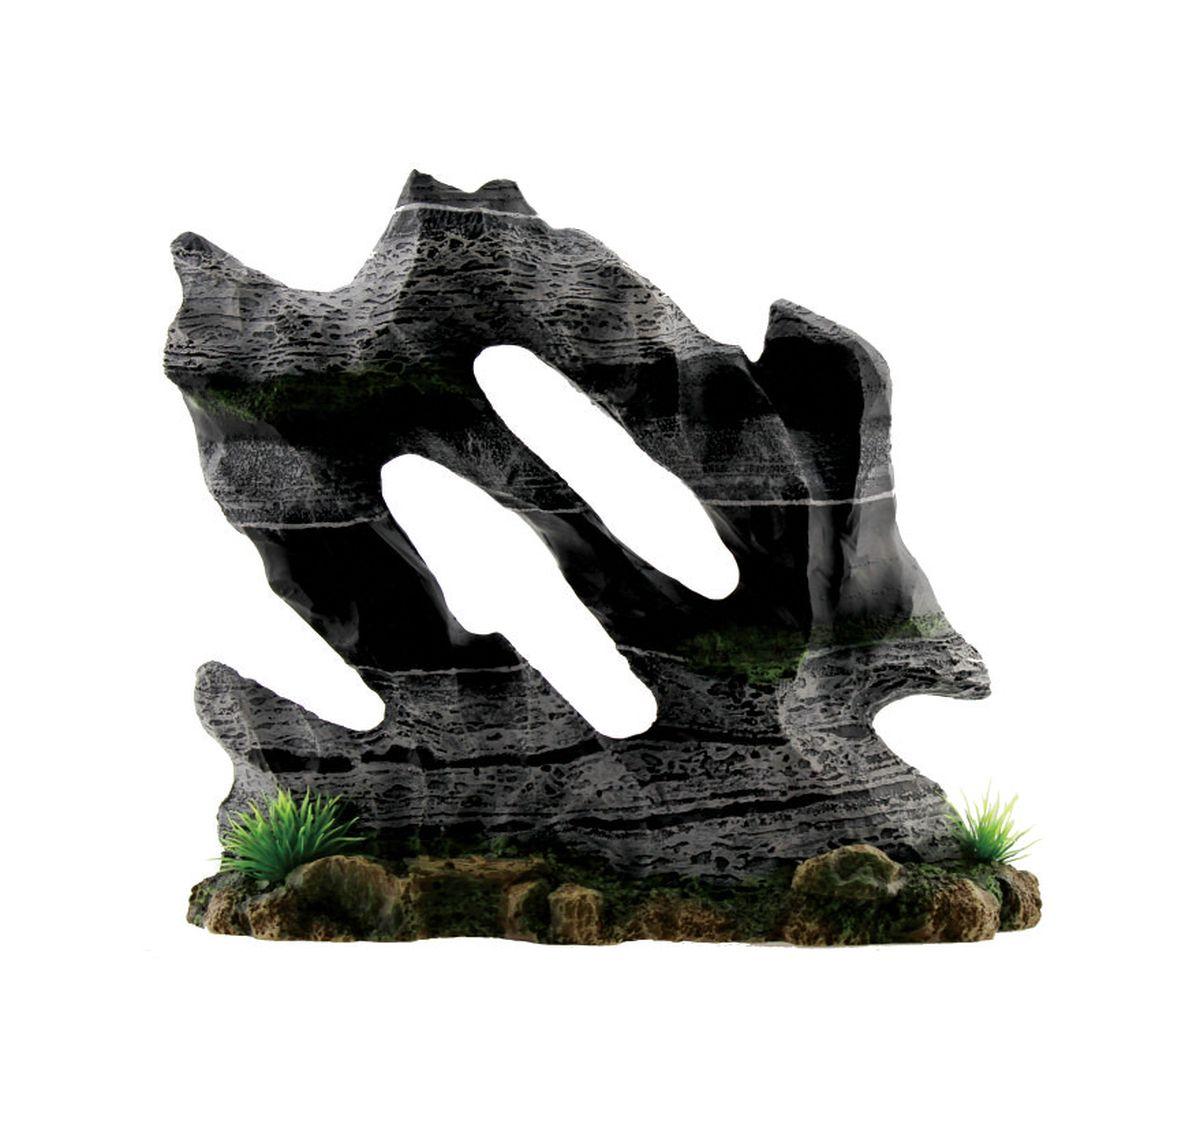 Декорация для аквариума ArtUniq Каменная скульптура, 24 x 9 x 21 смART-3115090Декорация для аквариума ArtUniq Каменная скульптура, 24 x 9 x 21 см